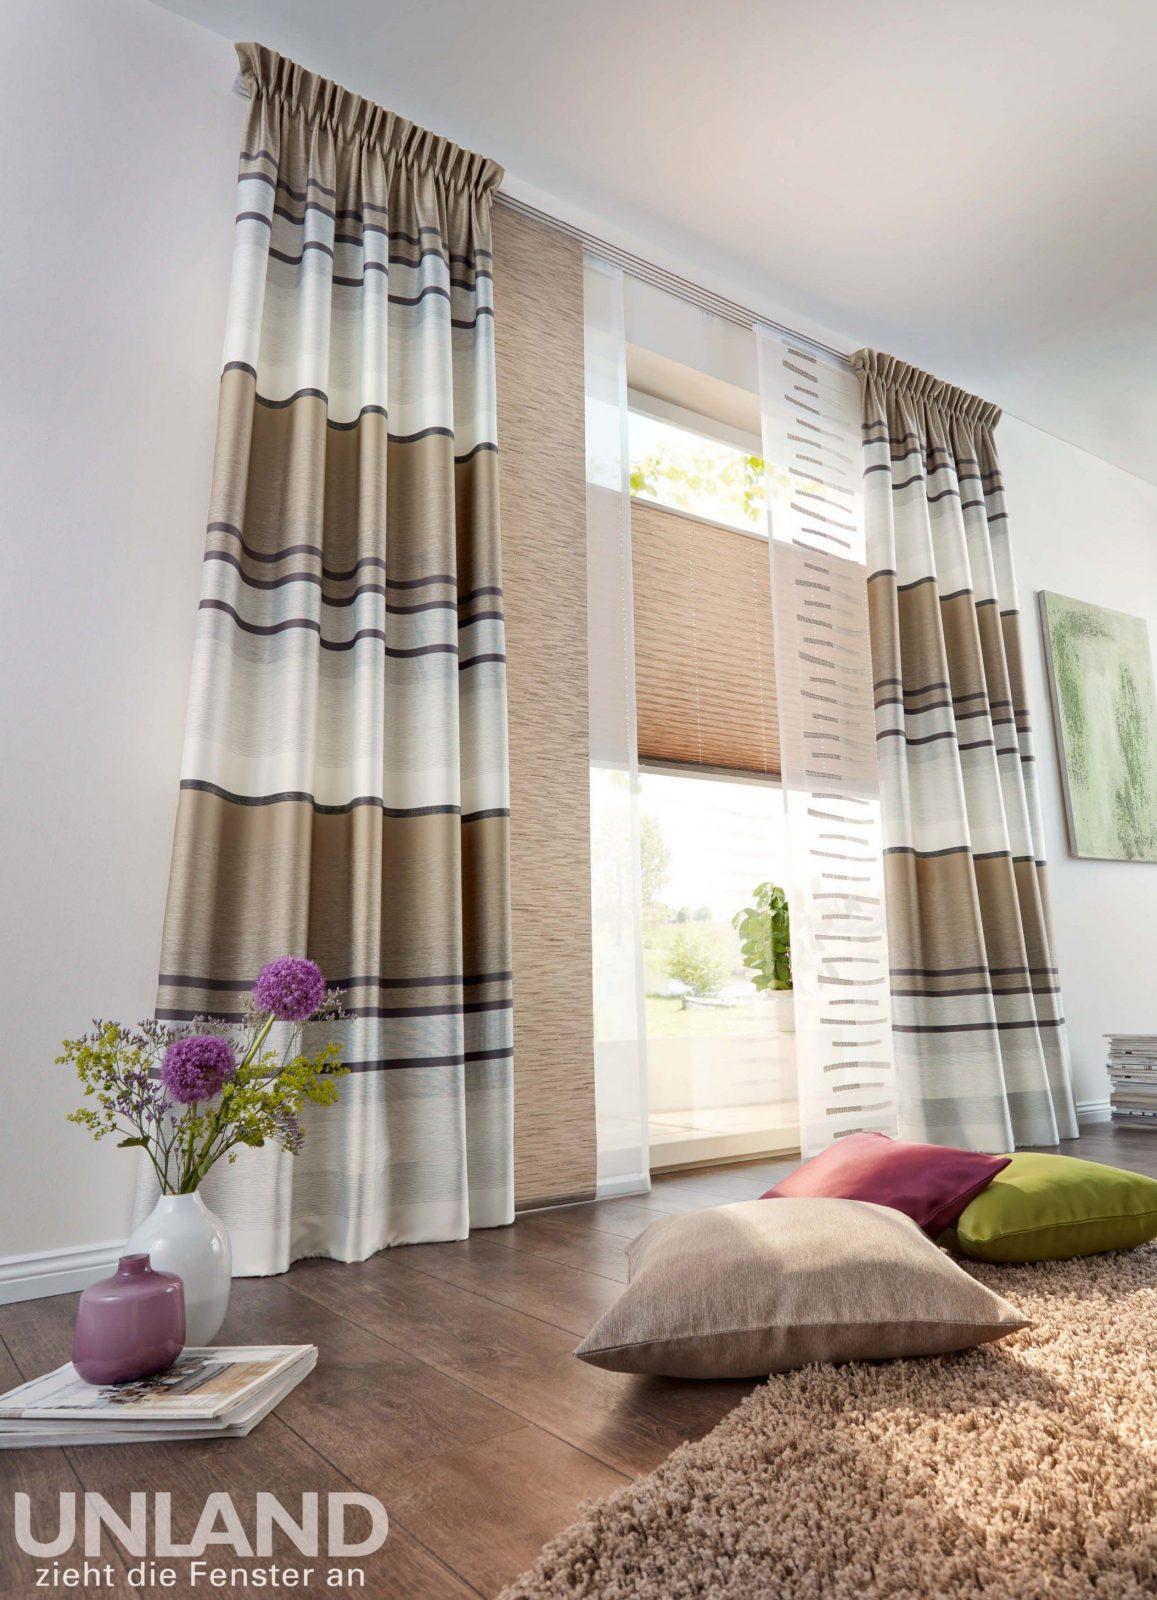 unland linares cappuccino vorhang fensterideen gardinen und von unland gardinen muster photo. Black Bedroom Furniture Sets. Home Design Ideas